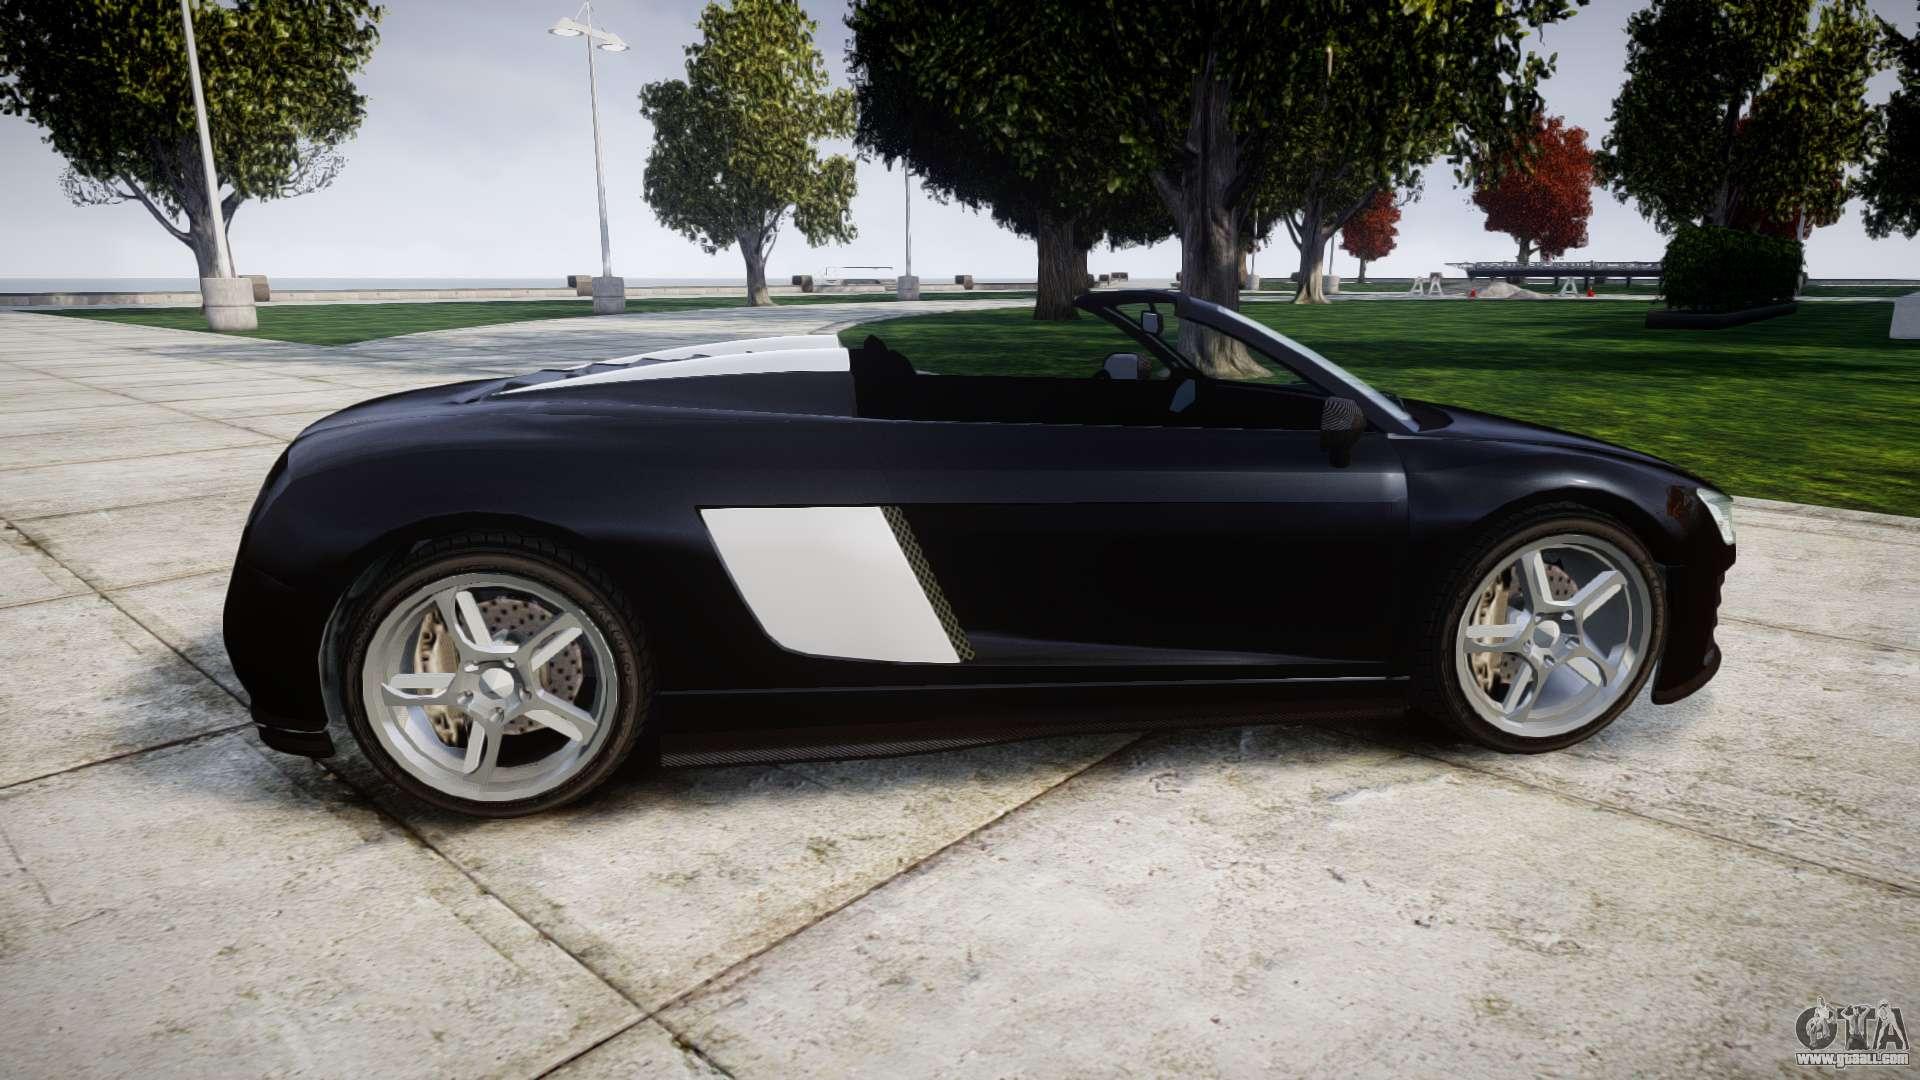 2013 Audi S8 Fsi Beta in addition 25651 Sultan Srx moreover 15071 Deluxo Hd also Albany together with Vehiculos Del Gta V Lista  pleta. on 9f gta iv